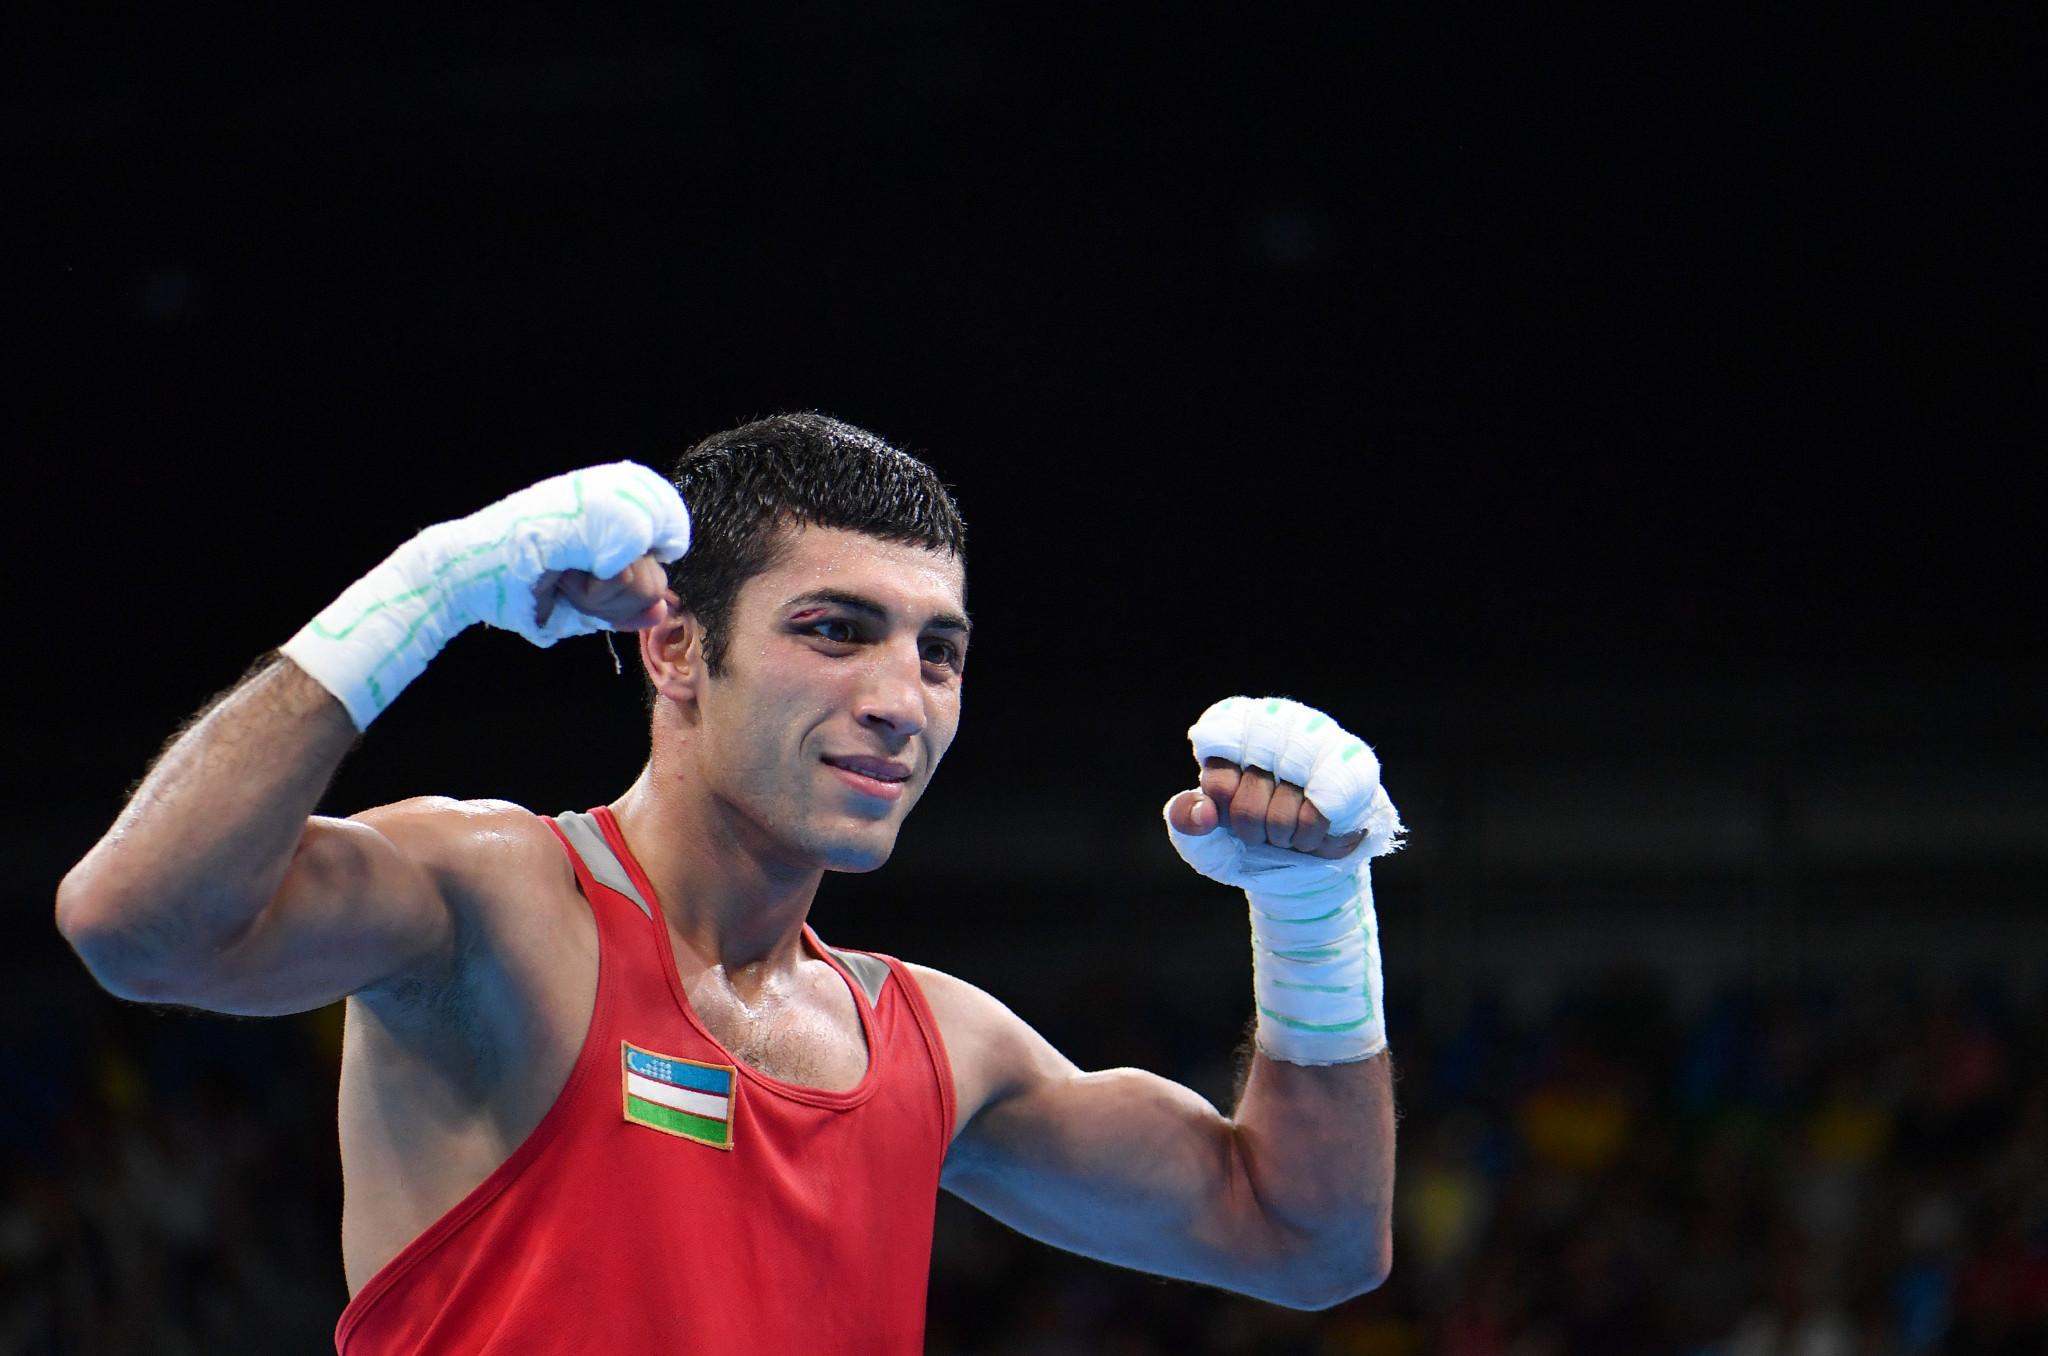 Shakhobidin Zoirov was one of six winners from Uzbekistan today ©Getty Images